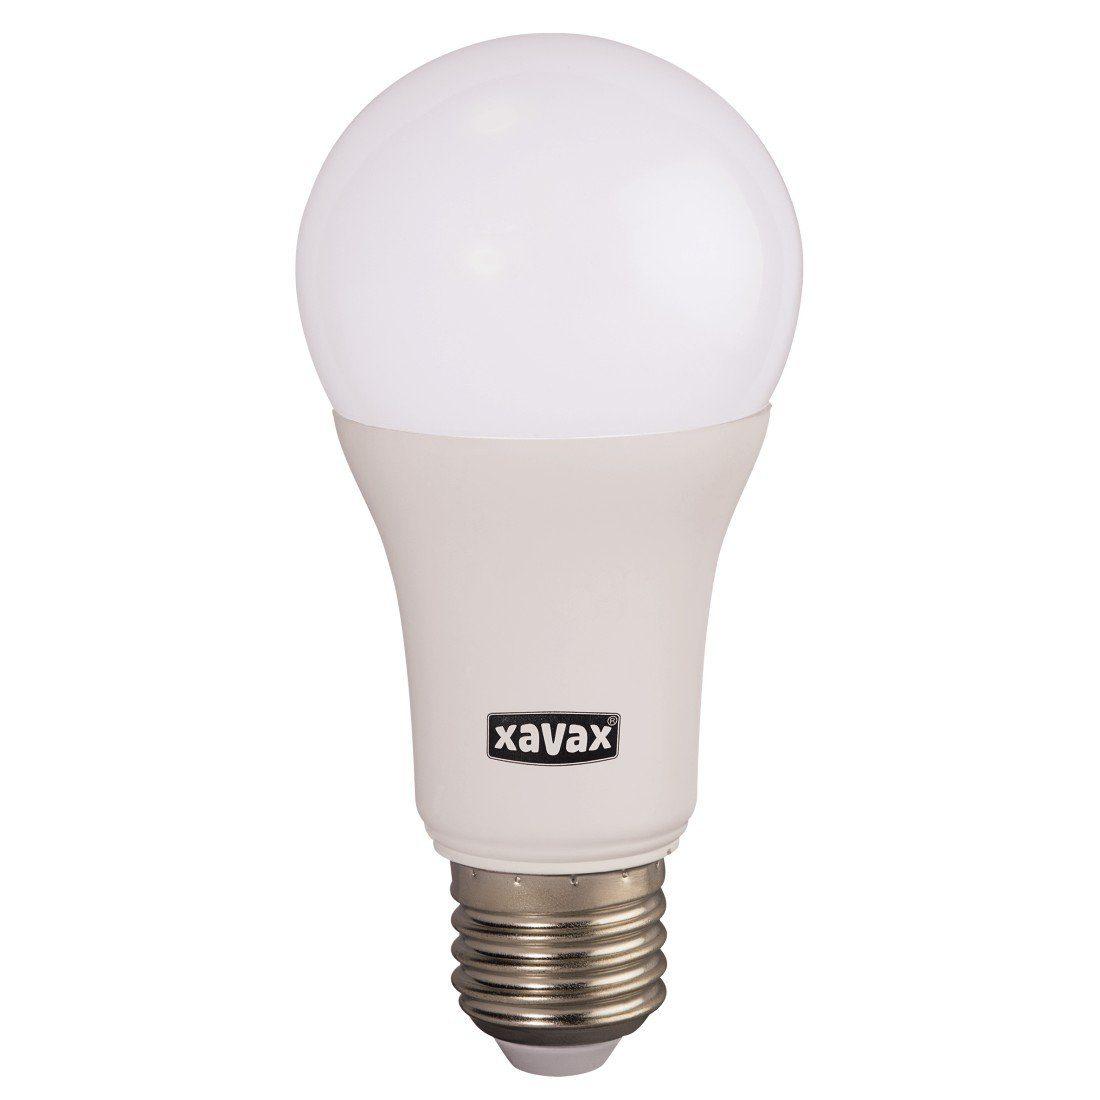 Xavax LED-Lampe, E27, 1060lm ersetzt 75W Glühlampe, Warmweiß